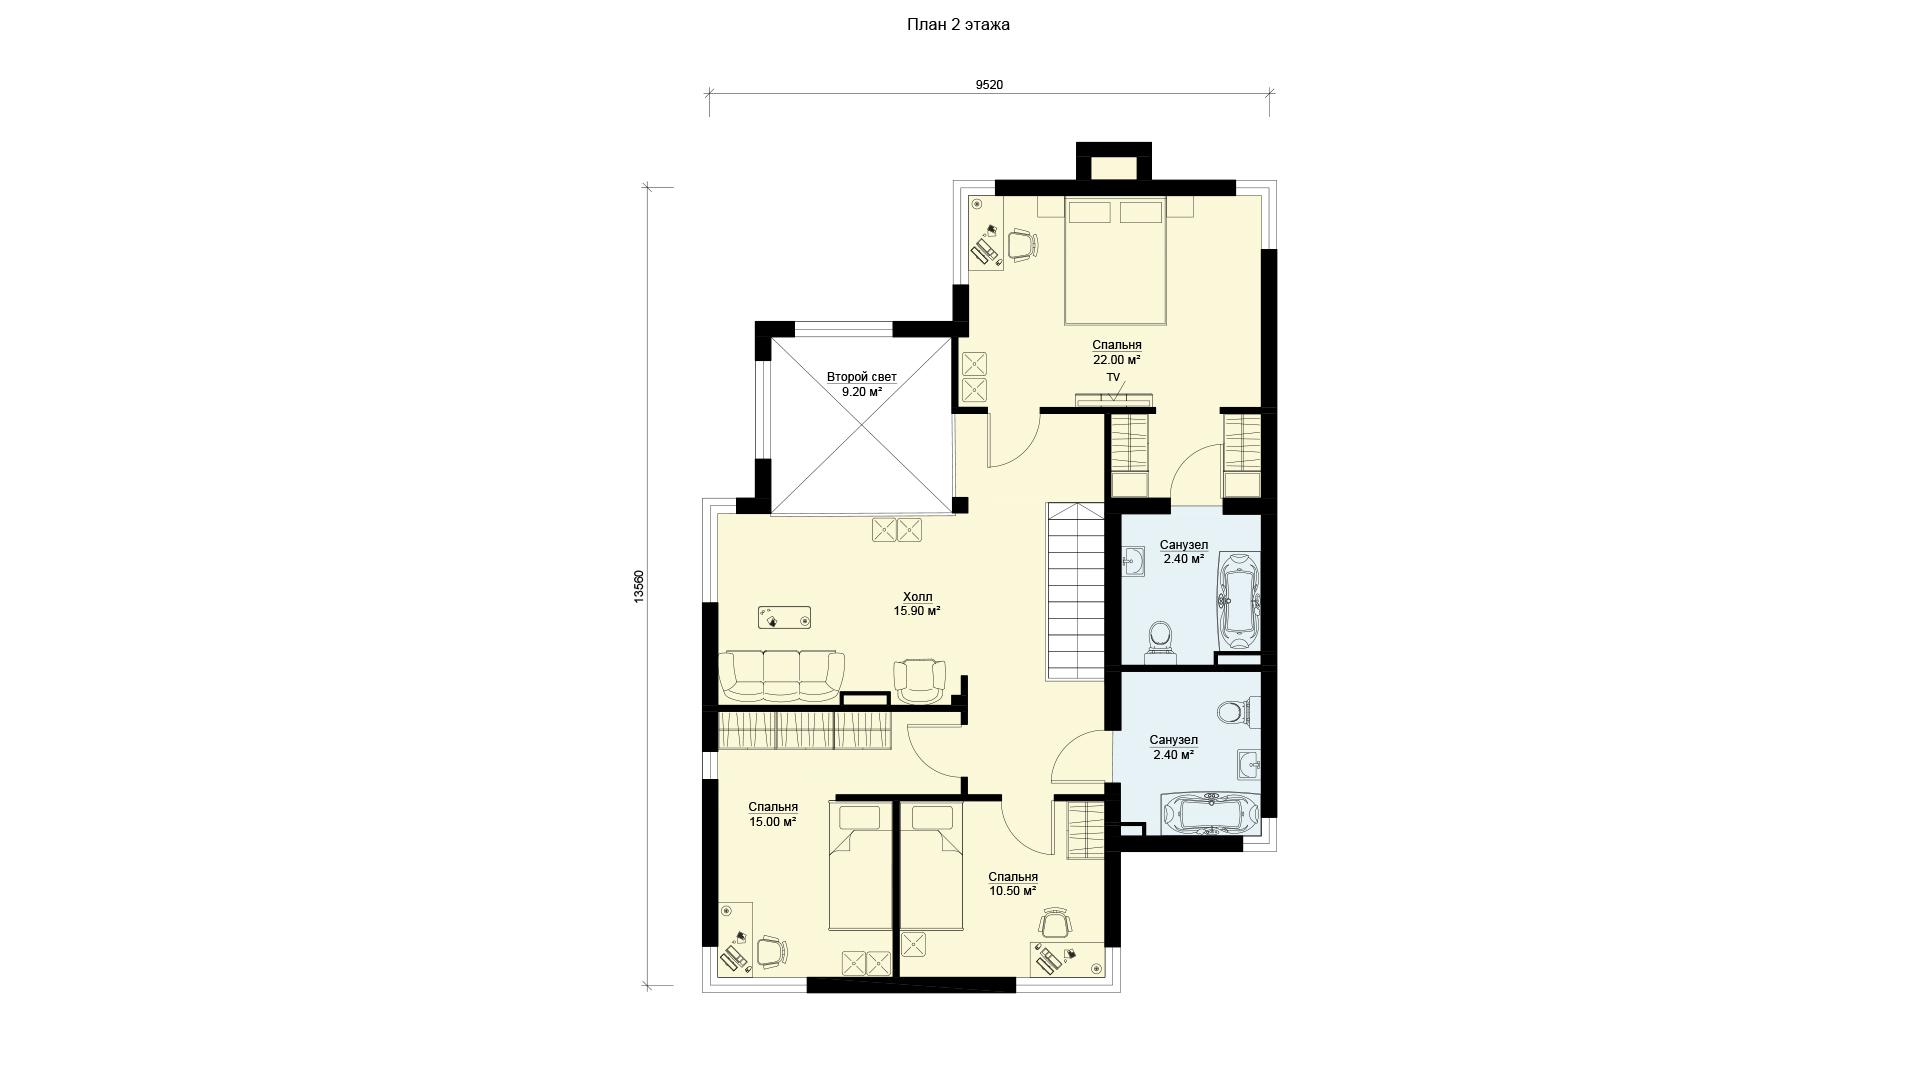 План второго этажа двухэтажного дома БЭНПАН, проект МС-239.